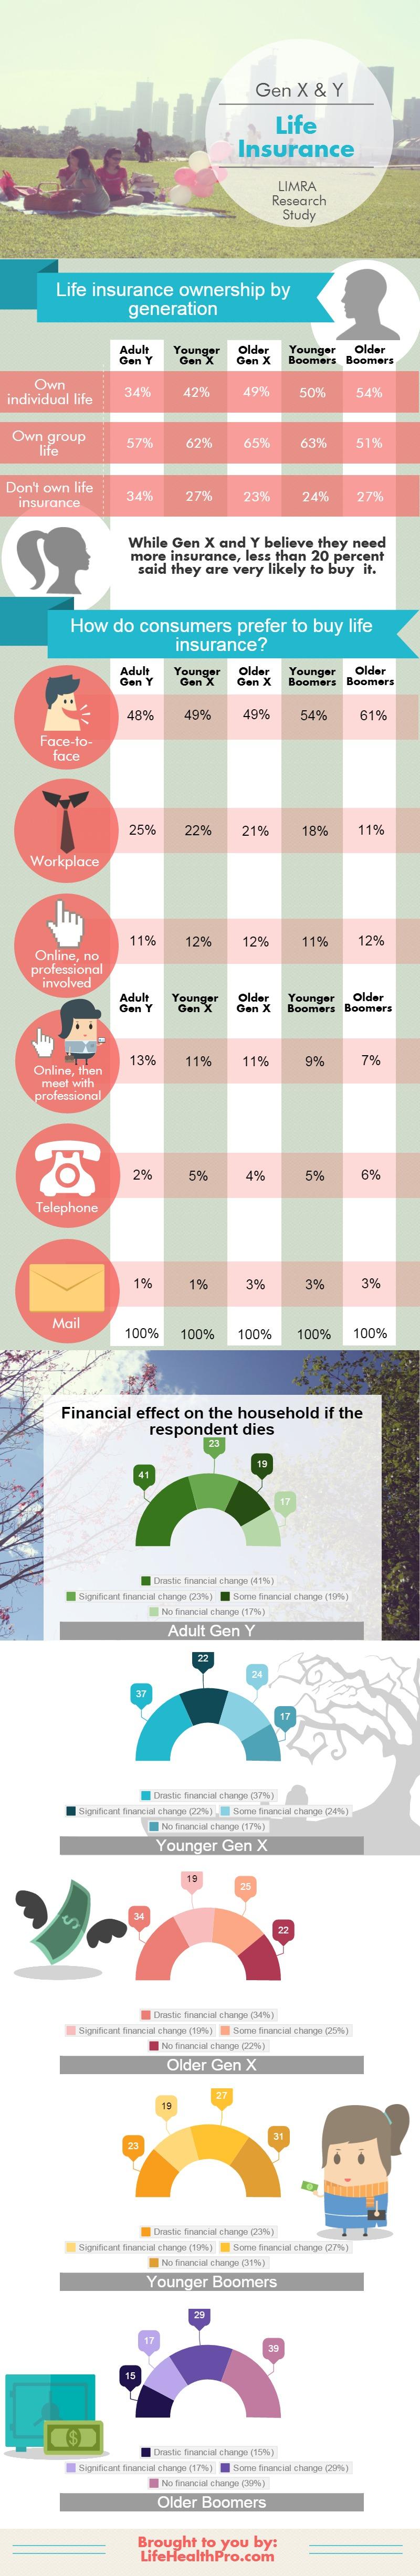 Limra-millennials-life-insurance-infographic